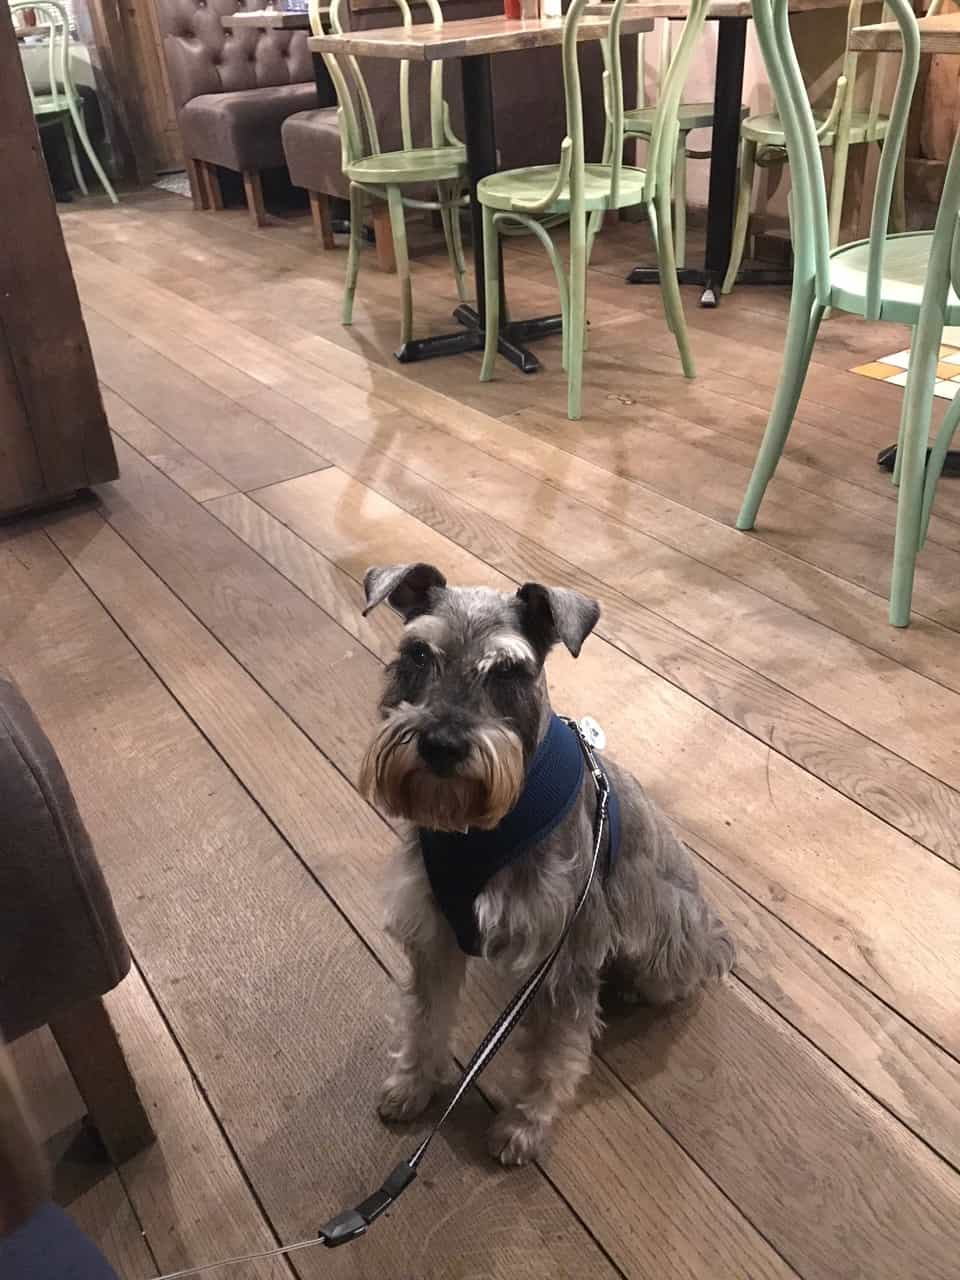 My Dog Friendly London By Pepper Chung the Schnauzer - Dog Friendly Notting Hill 17